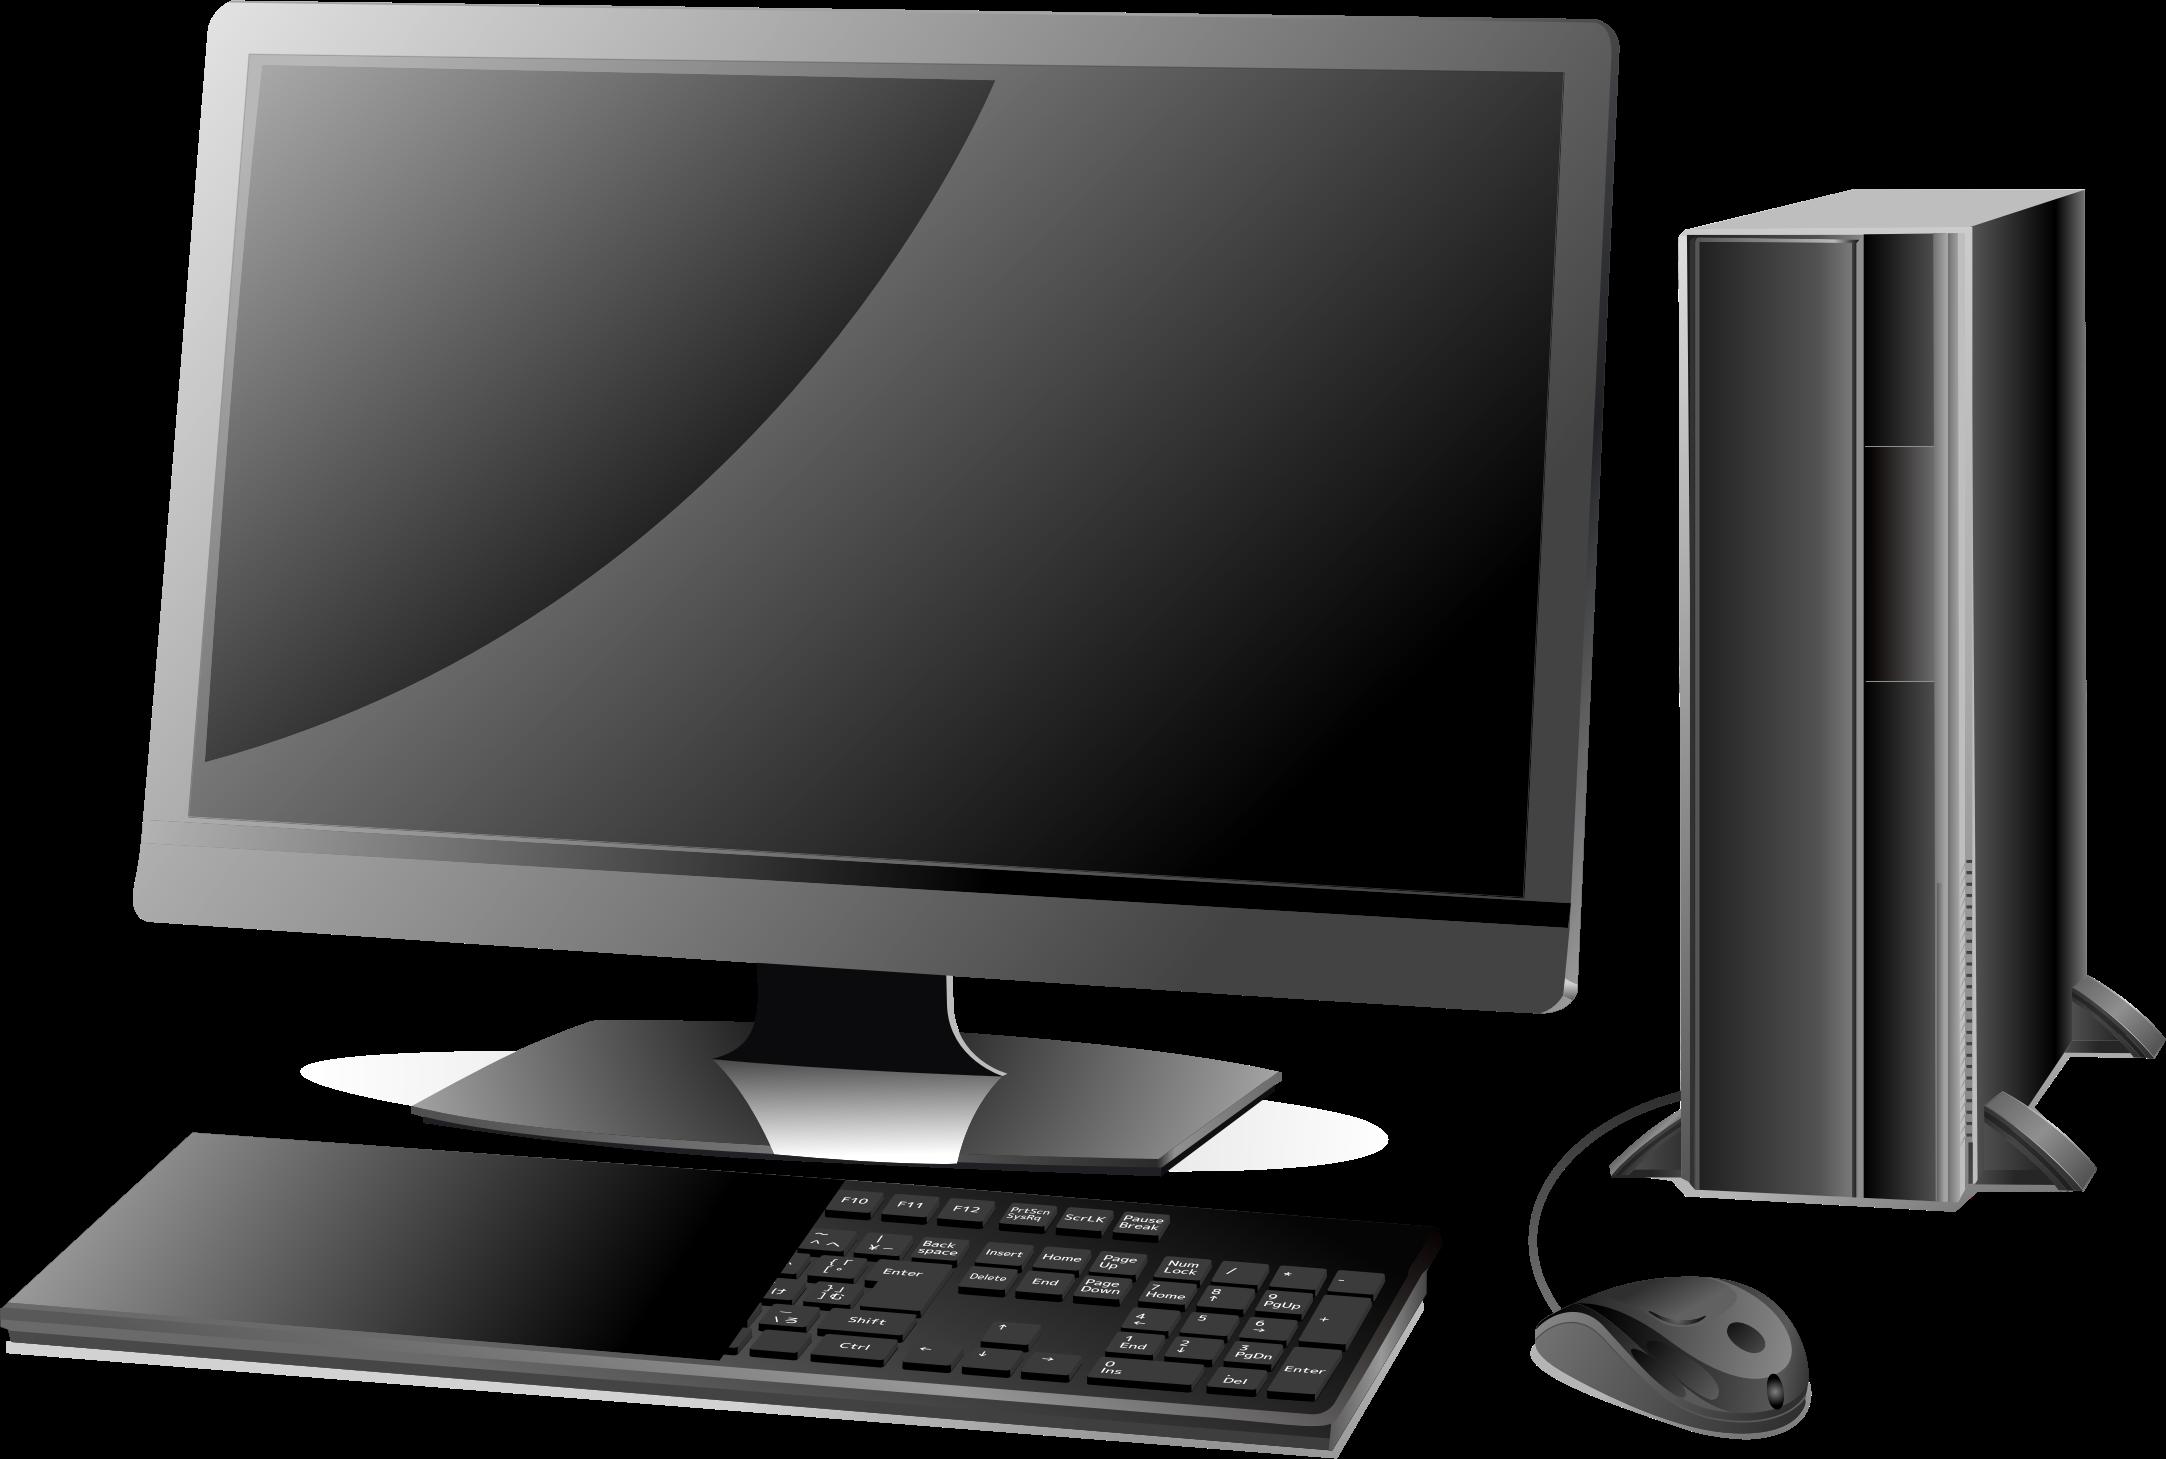 Pc clipart desktop. Computer big image png